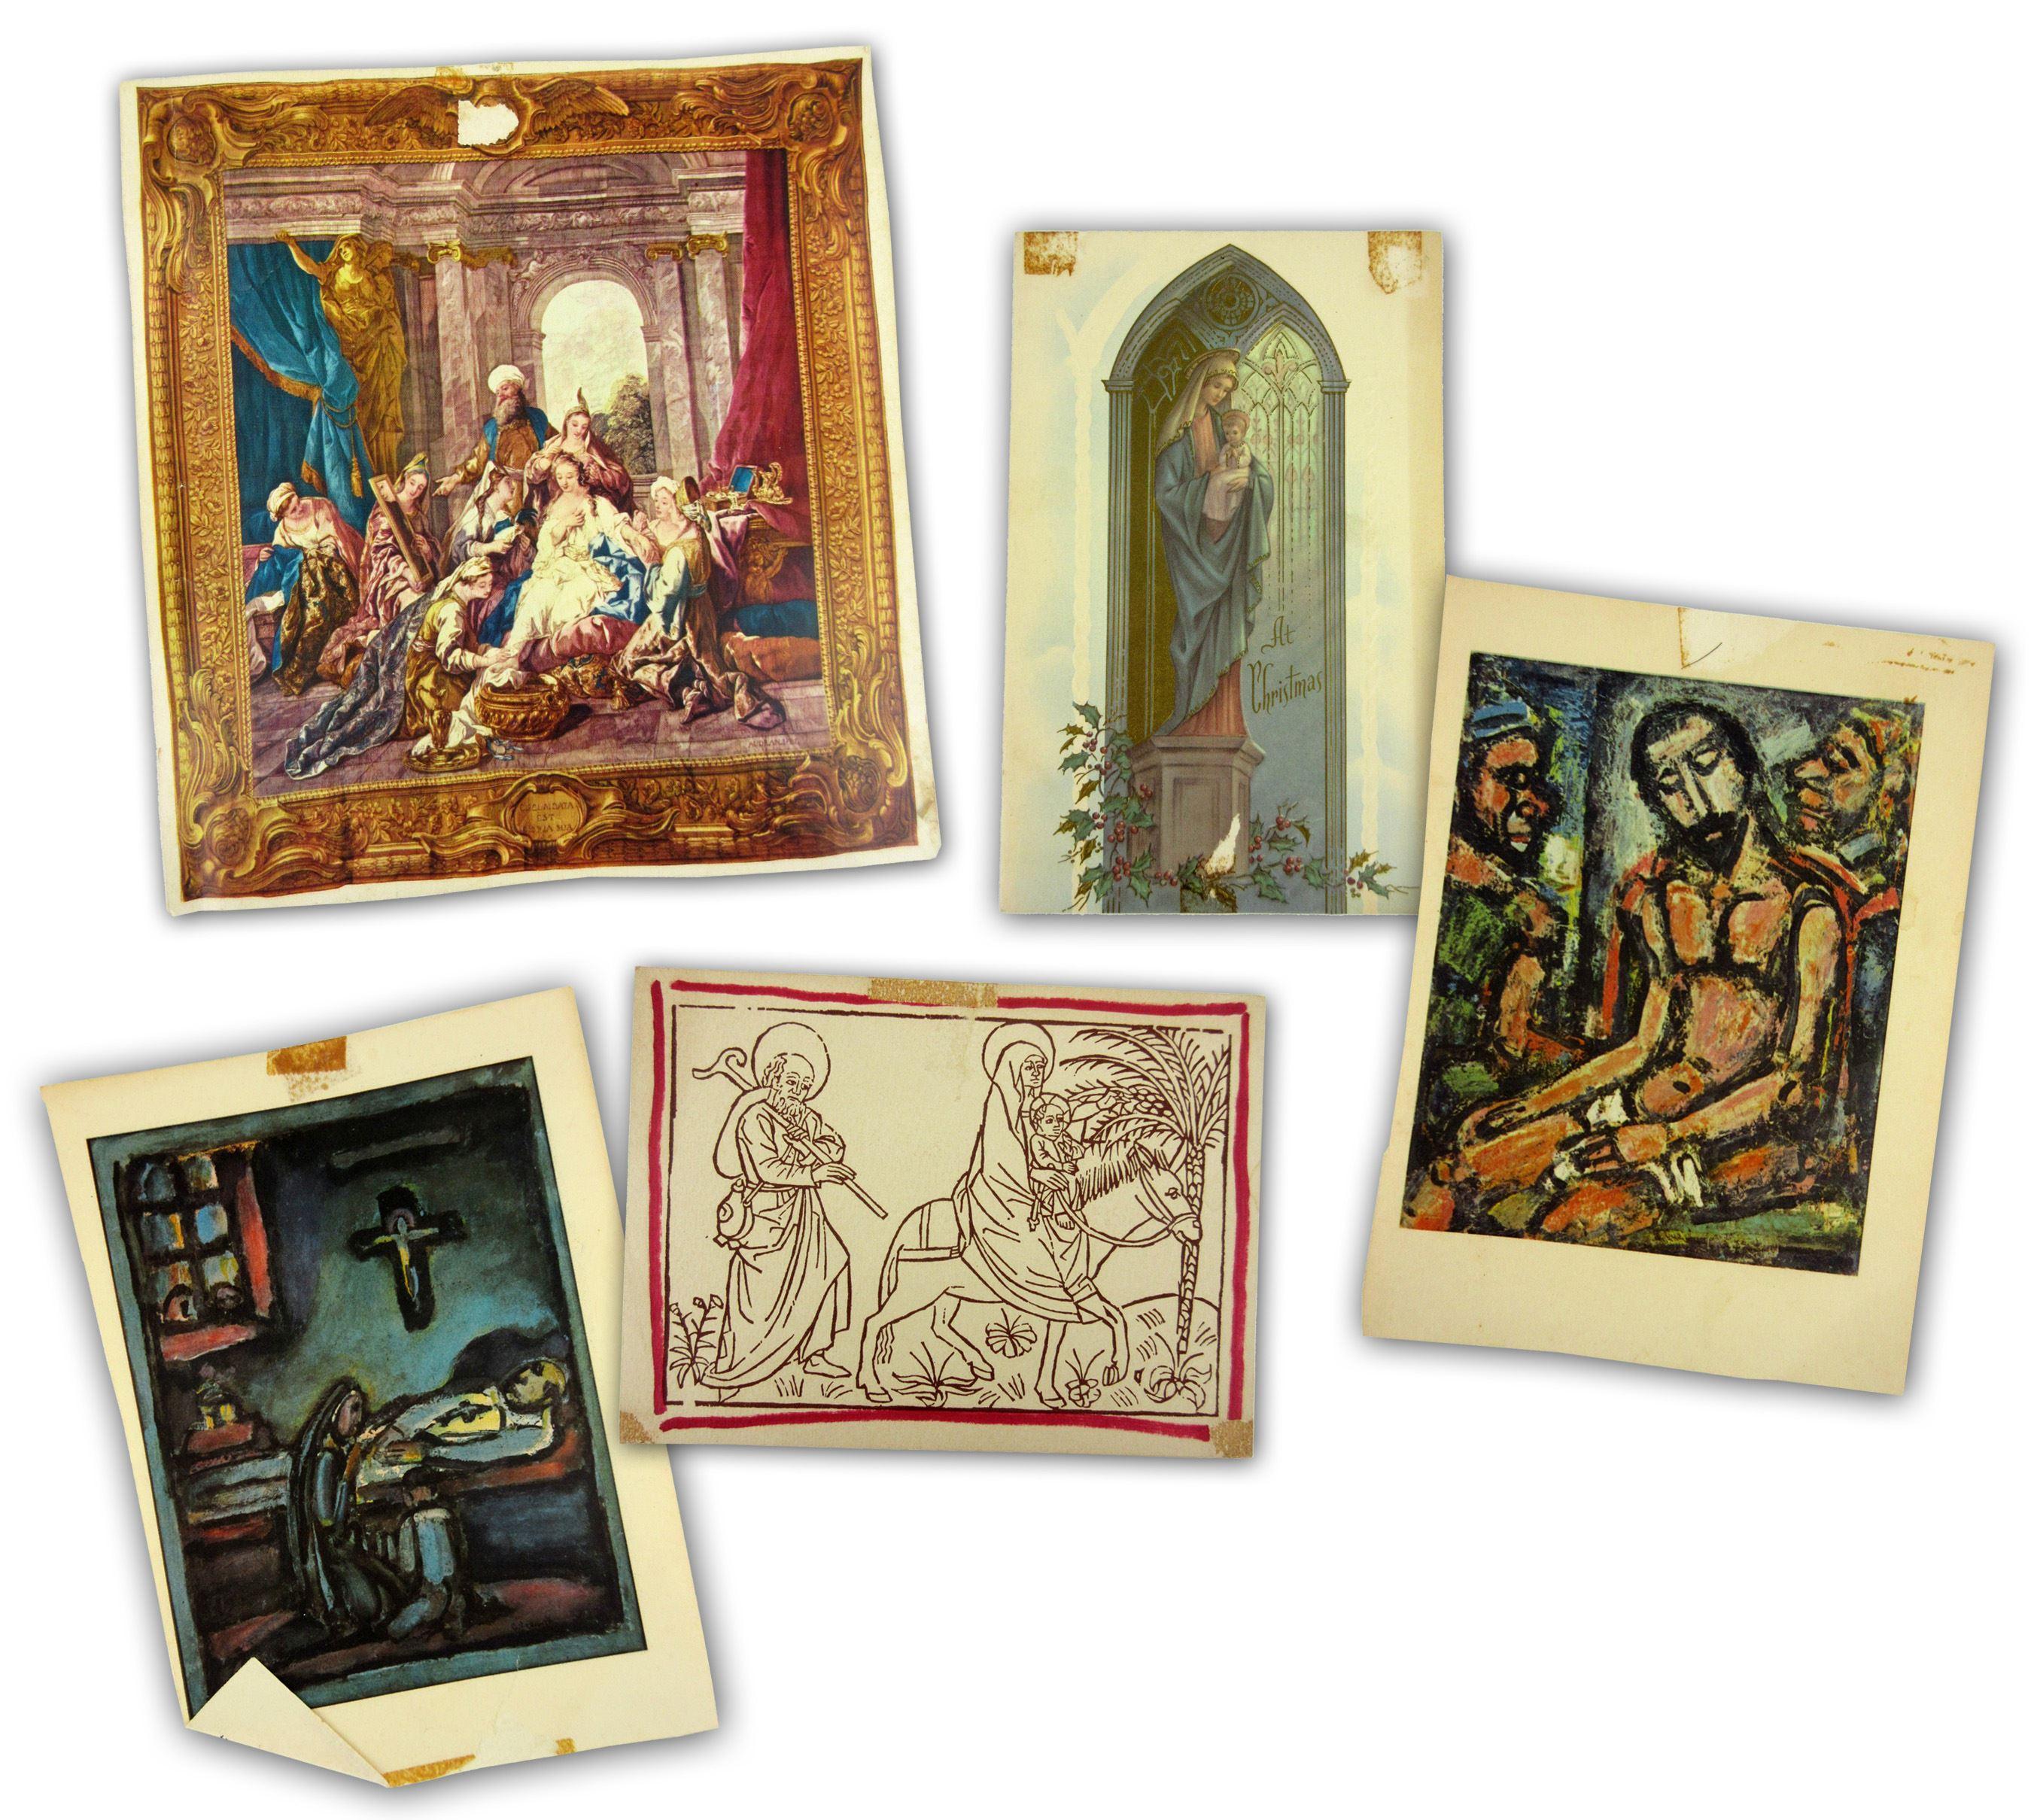 Jack Kerouac's Religious Wall Art, Demonstrating the Importance of his Roman Catholic Faith